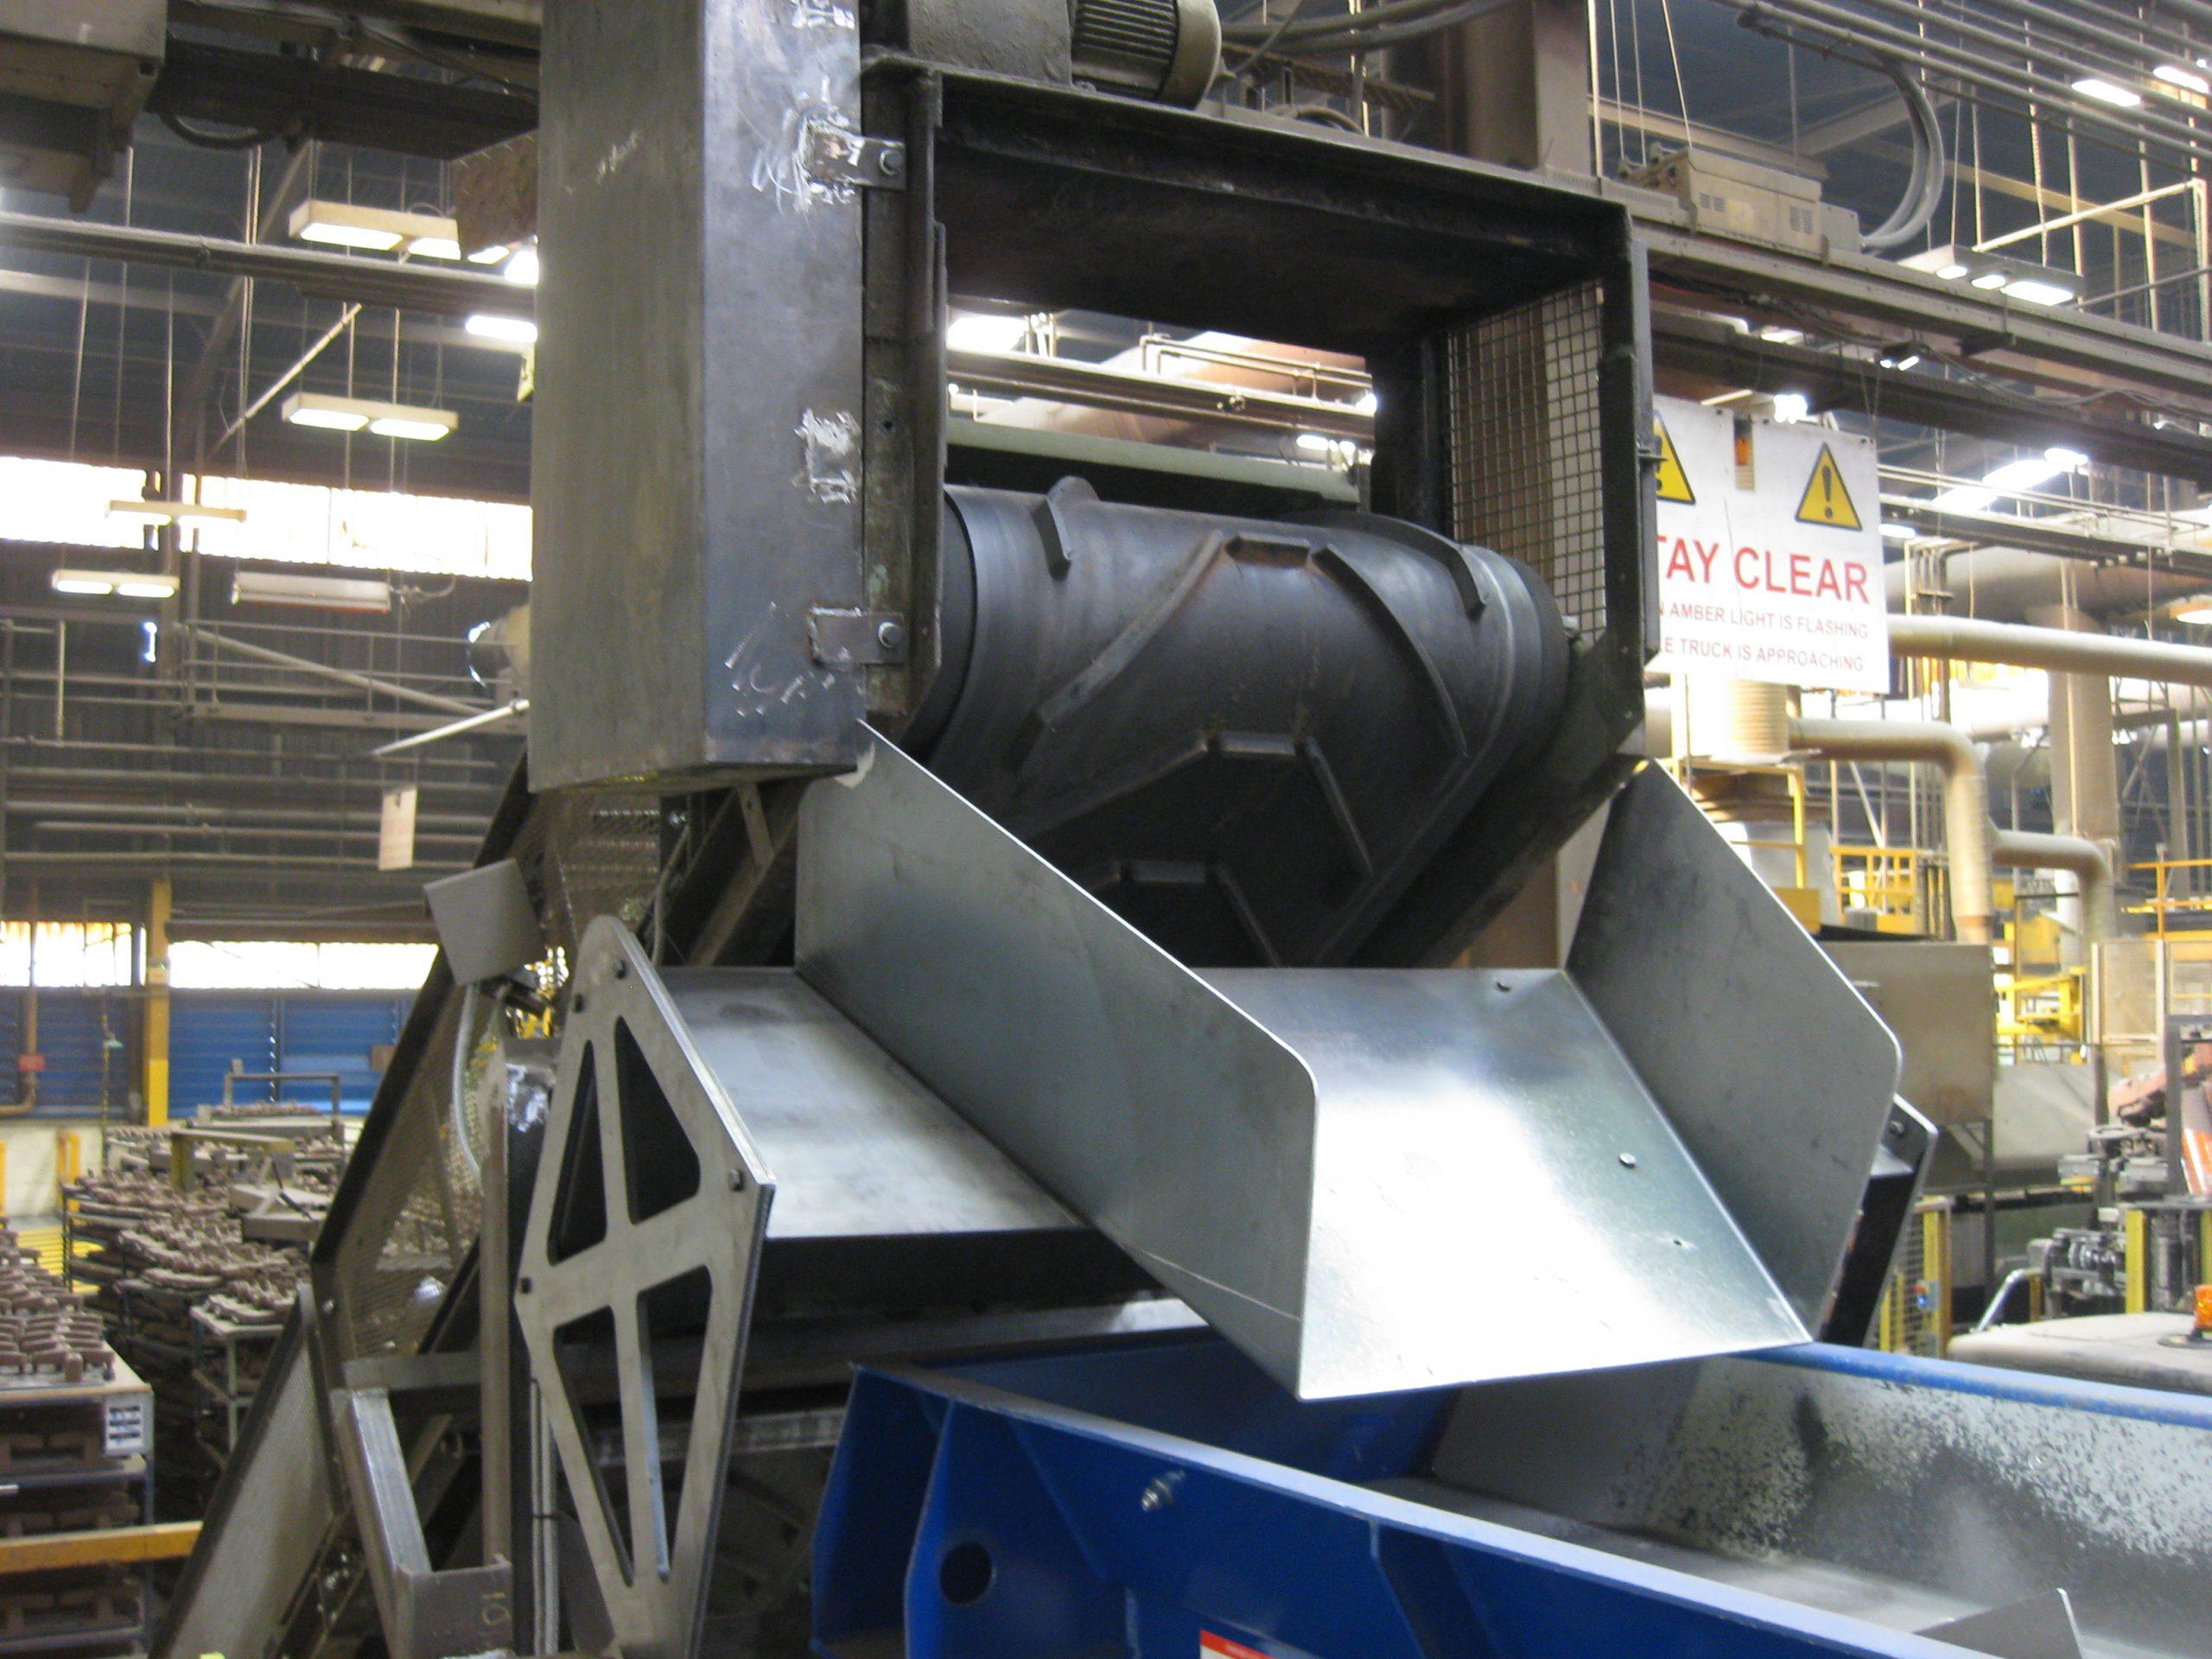 Magnet head pulley in aluminium foundry